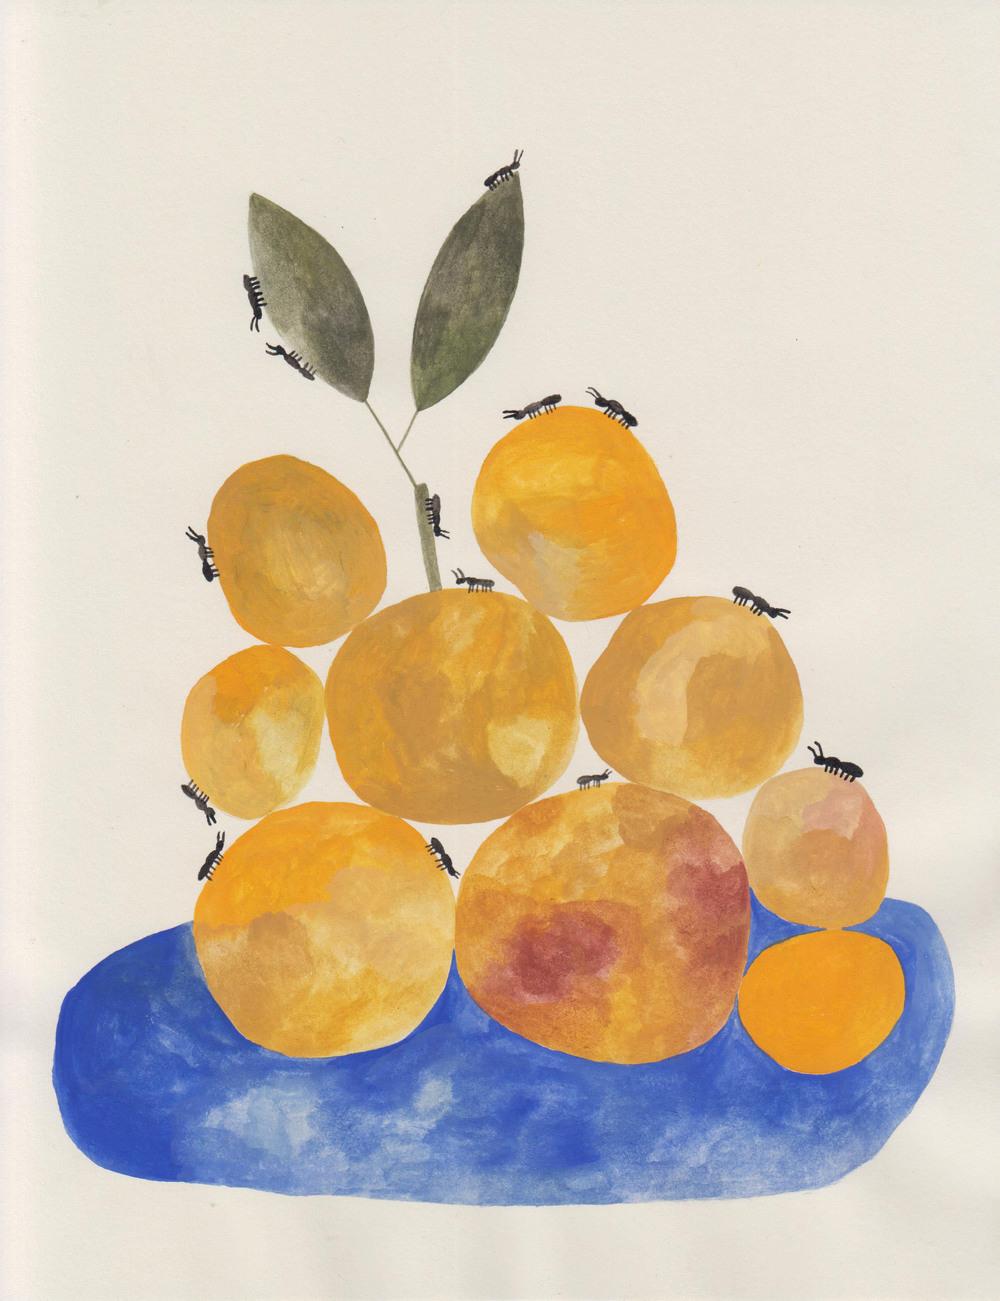 OrangesandAnts_AHW.jpg